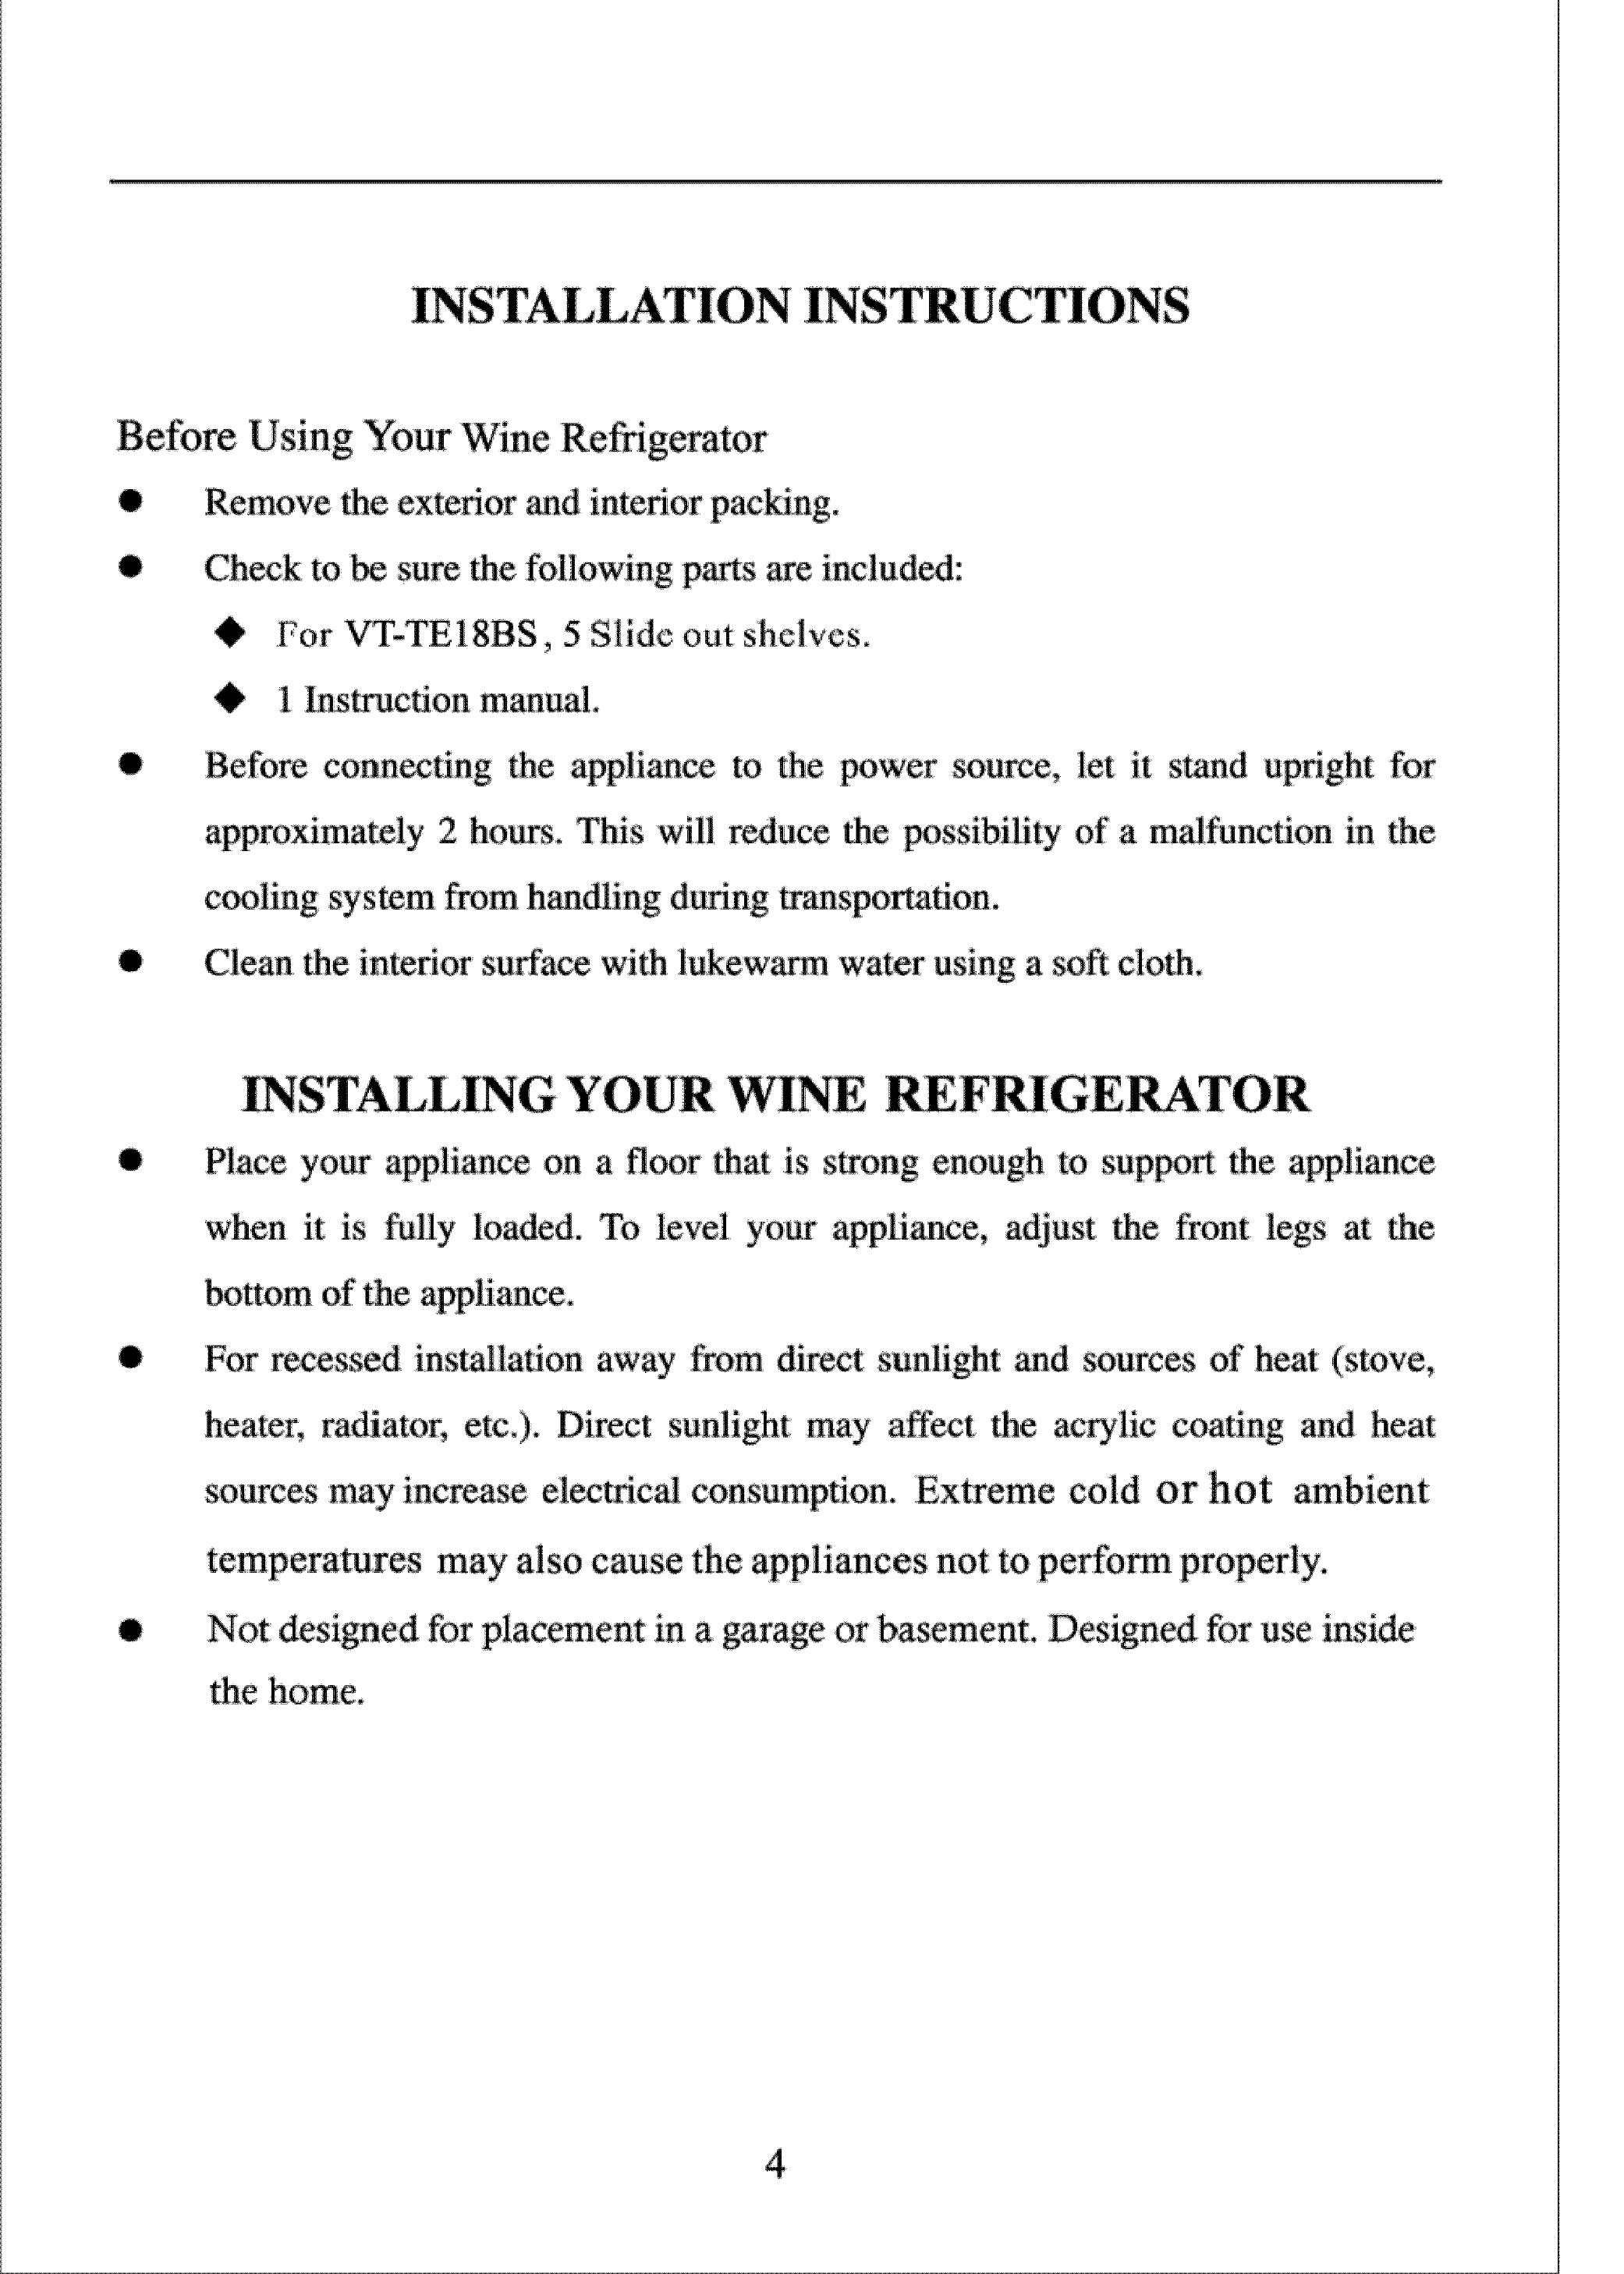 VINOTEMP Wine Cooler Manual L0801832